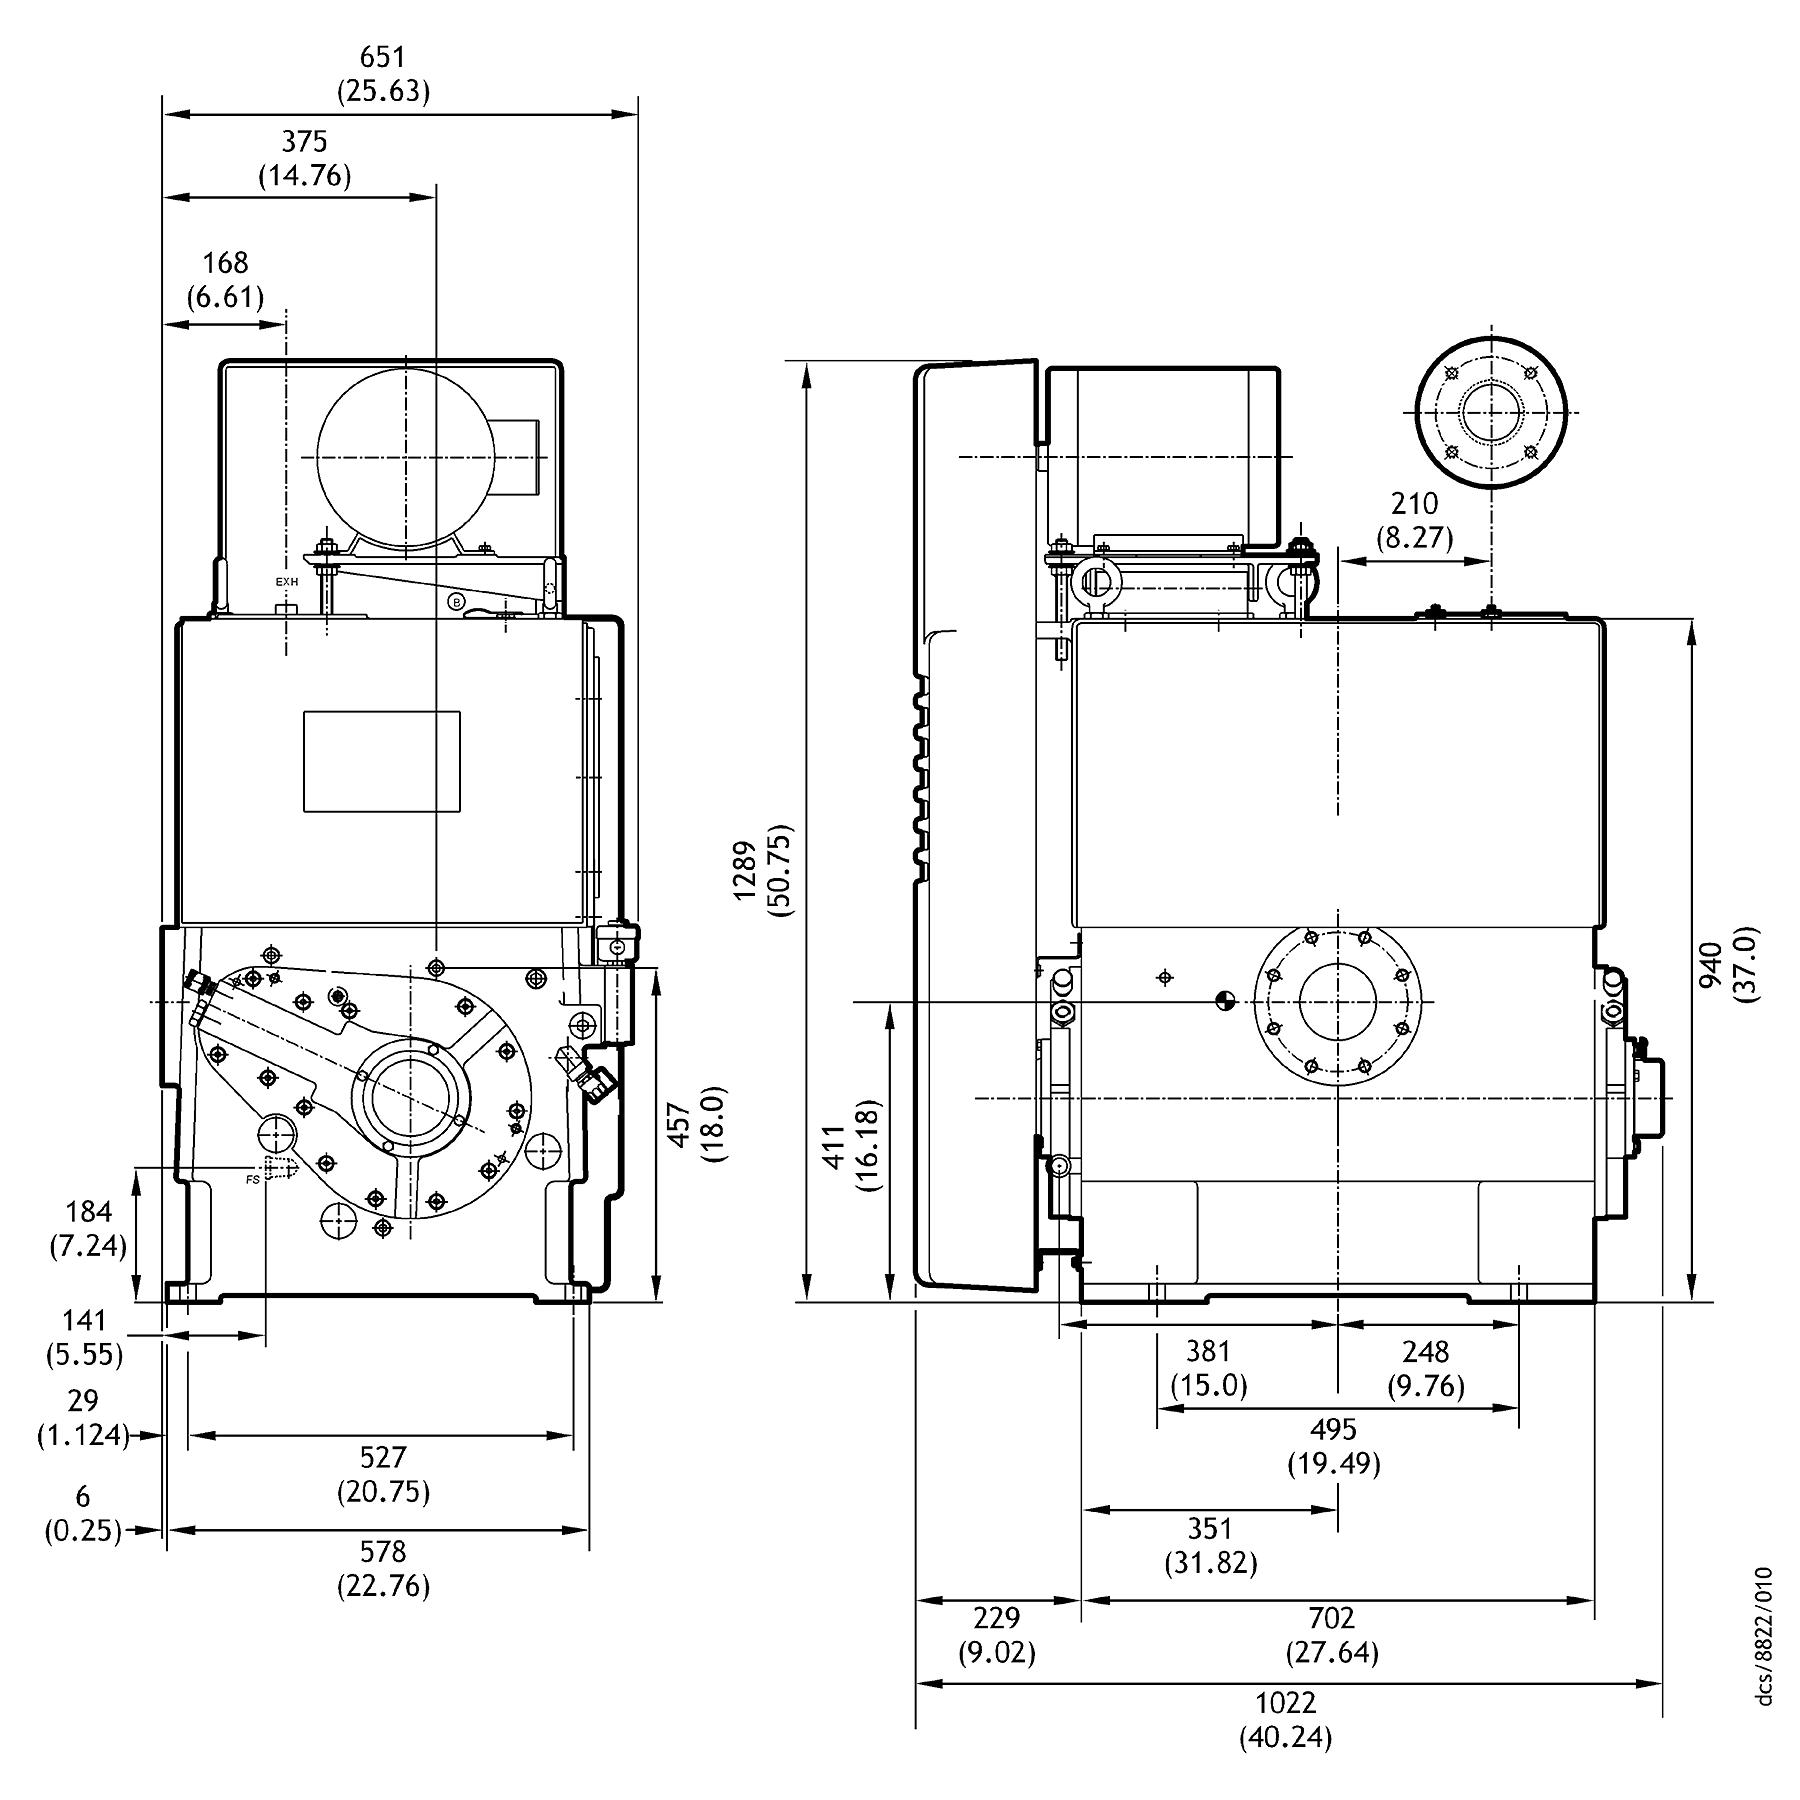 Edwards Stokes 412J Microvac Rotary Piston Vacuum Pump - NEW